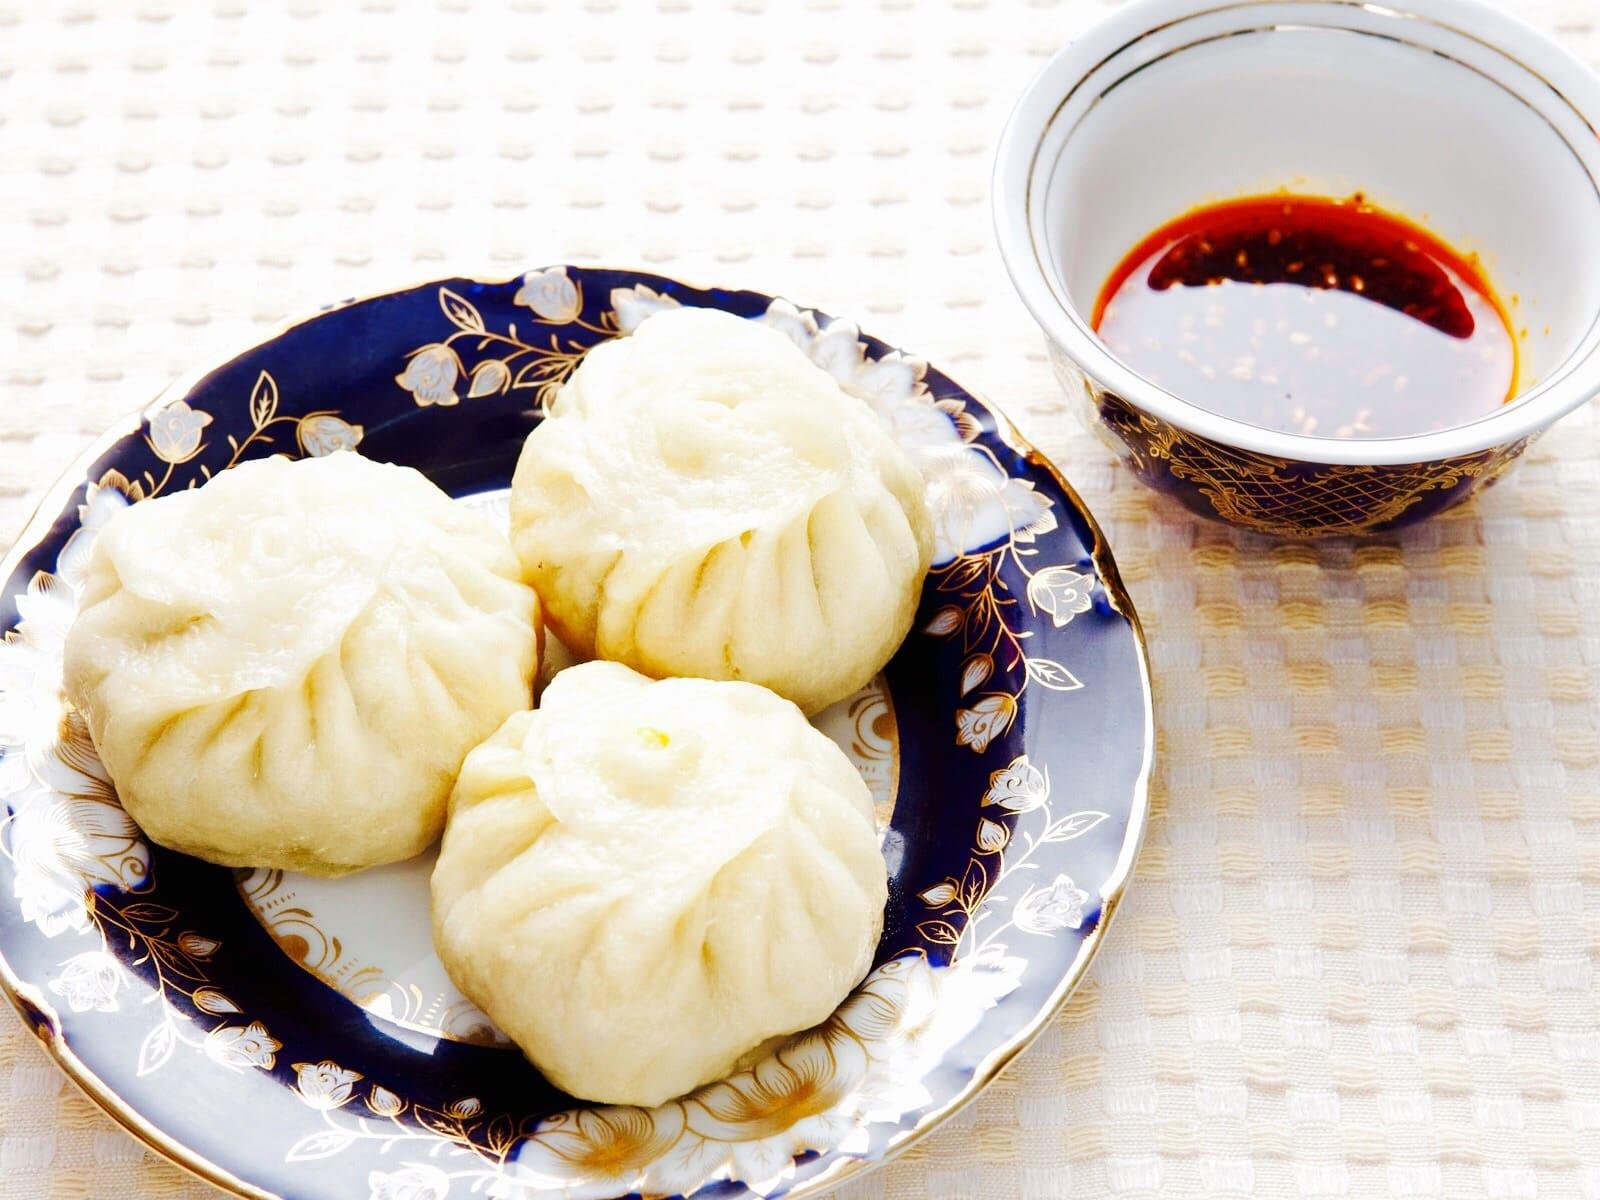 The Hirshon Kawa Manta (Uyghur Lamb and Pumpkin Dumplings) & Dipping Sauce – كاۋا مانتا